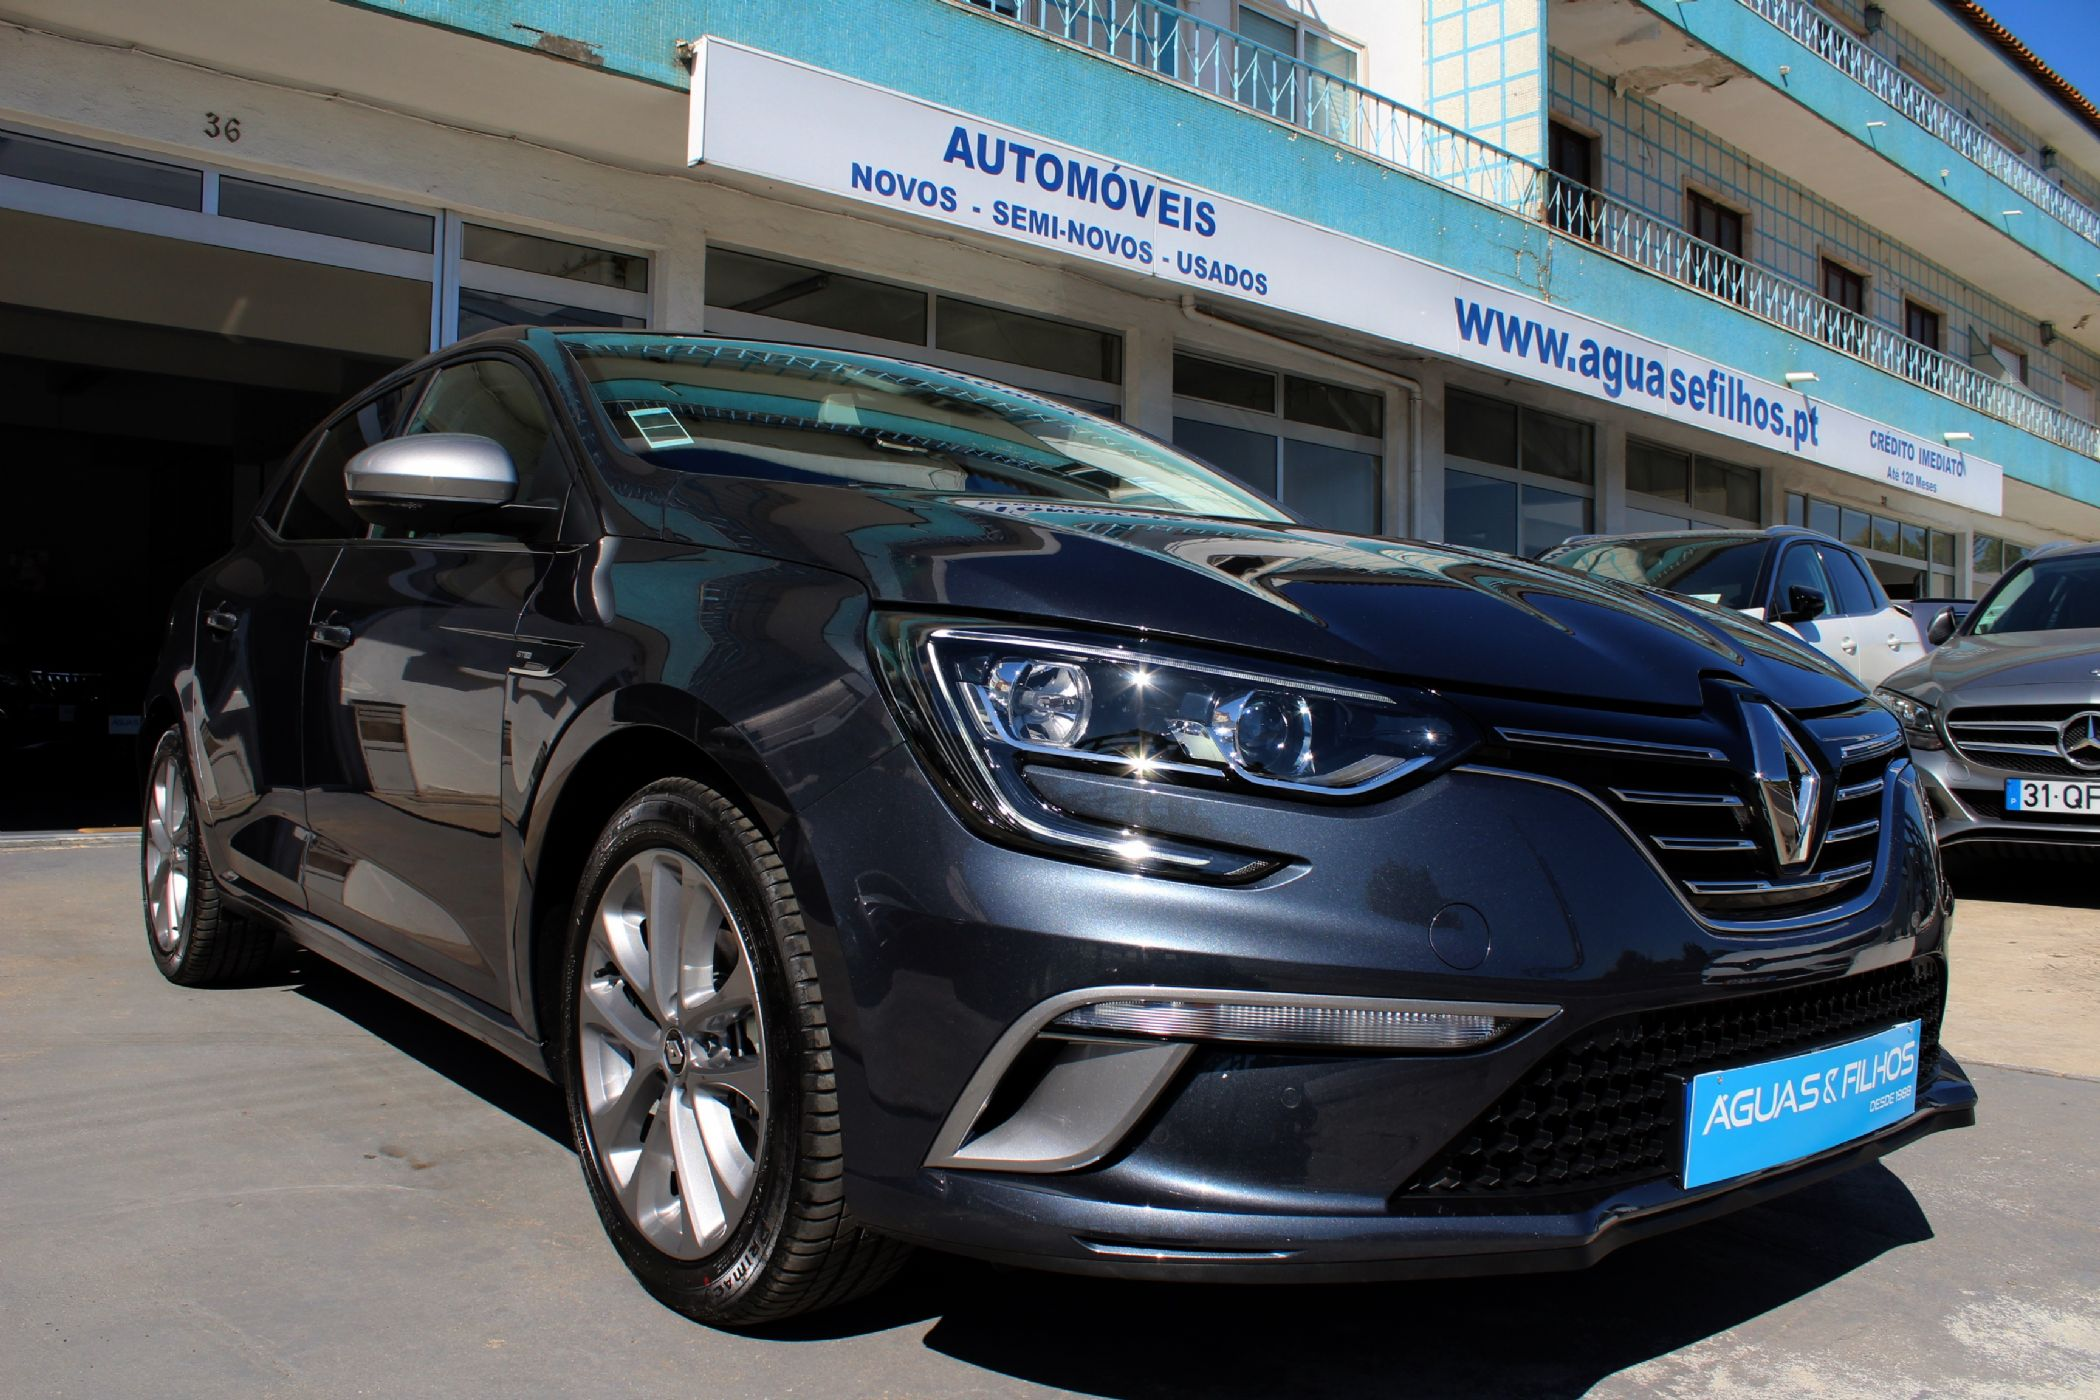 <b>Renault  Megane  </b>1.5 Dci  Gt Line 115cv (2019)